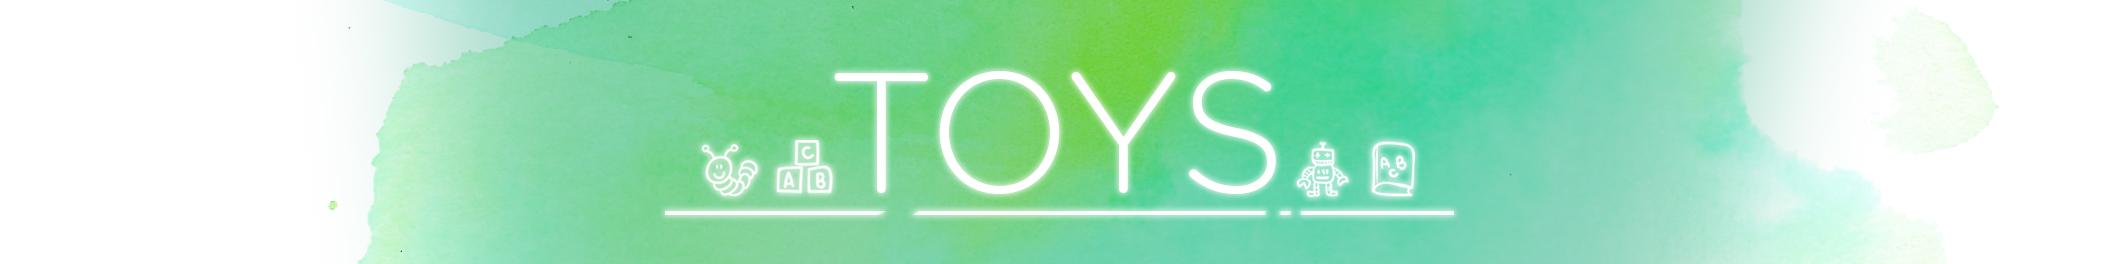 Toys & Games header